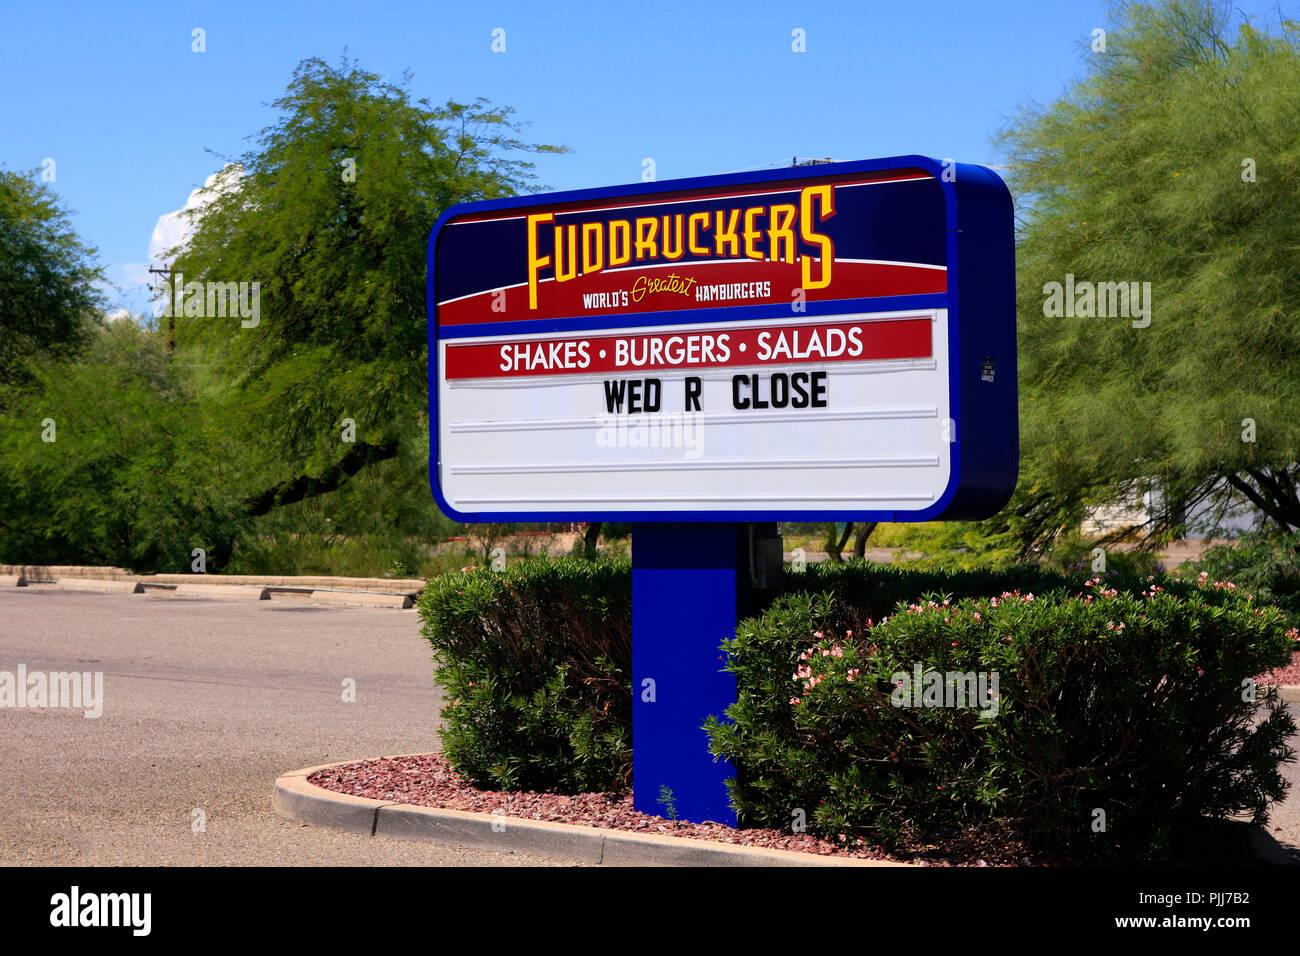 Fuddruckers American Fast Casual Hamburger Restaurant Sign